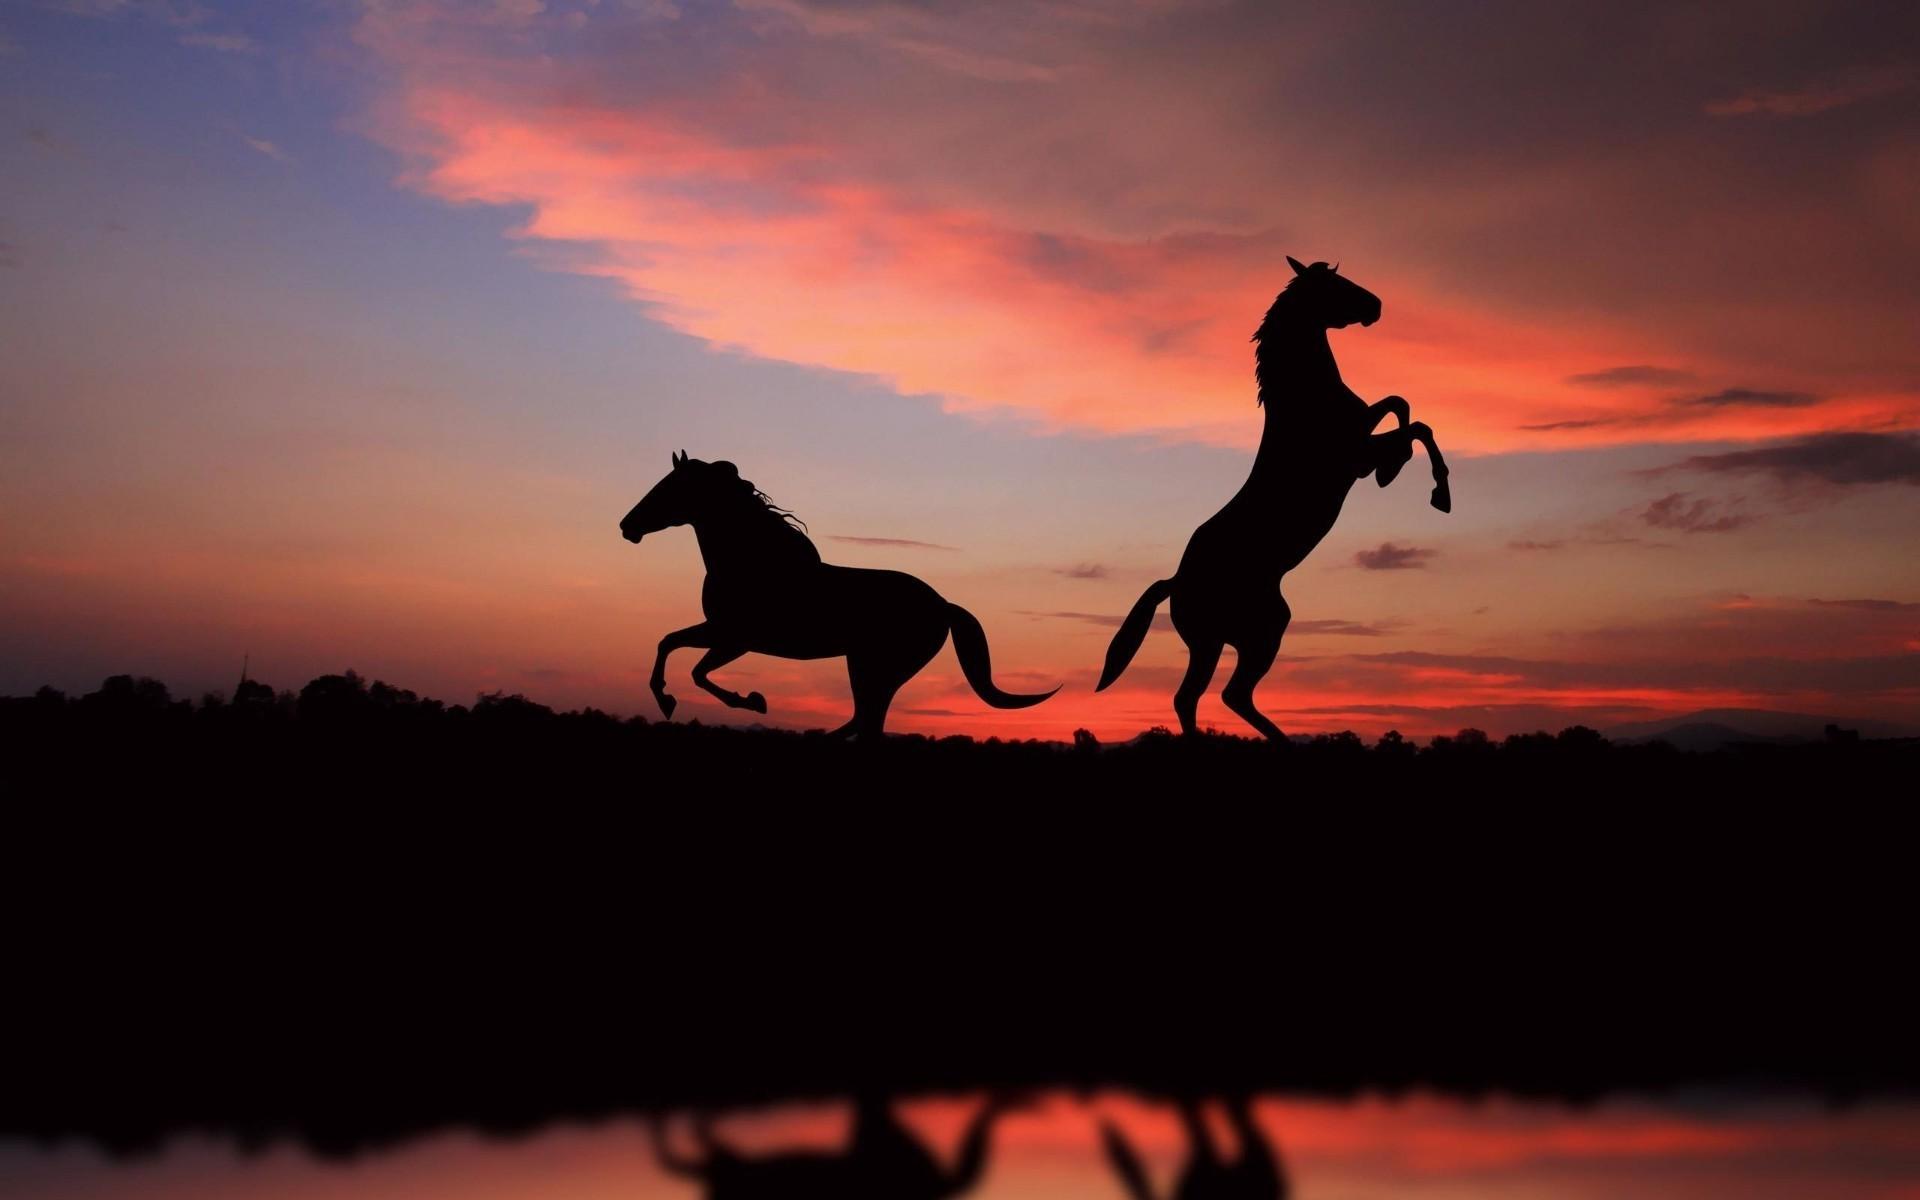 Картинки с изображением лошадей на восходе и закате, открытки свадьбе картинки